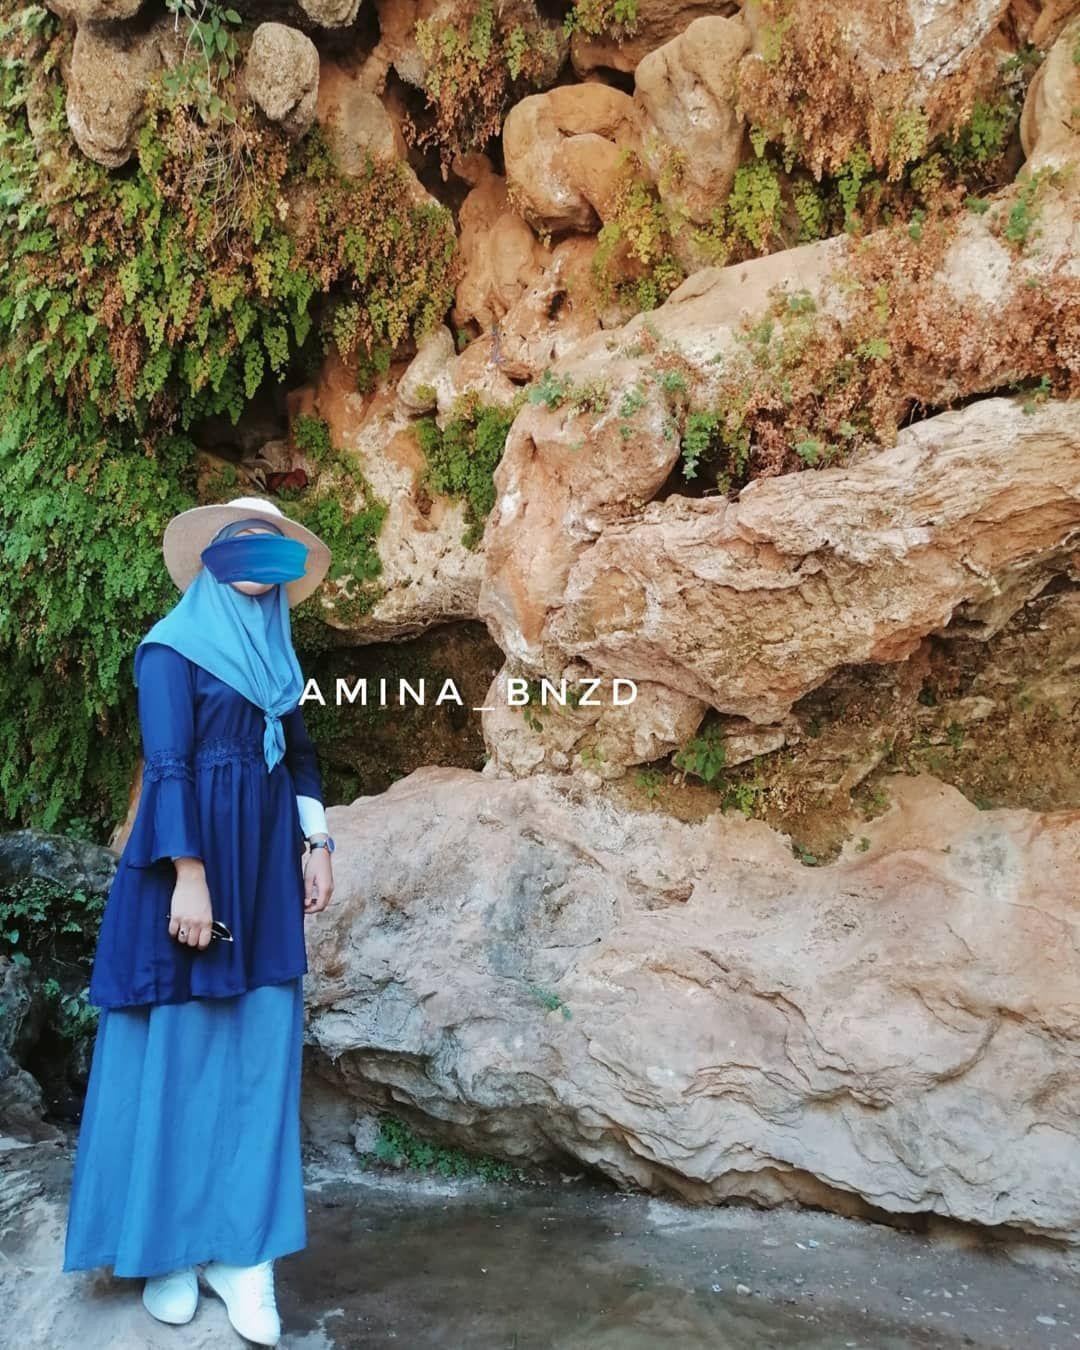 44 Likes 1 Comments 𝕬𝖒𝖎𝖓𝖆 أ مين ة Amina Bnzd On Instagram وكل ح سن يلتمس النظرة الحية التي تراه جميل ا لتعطيه معناه مصطف Fashion Hijab